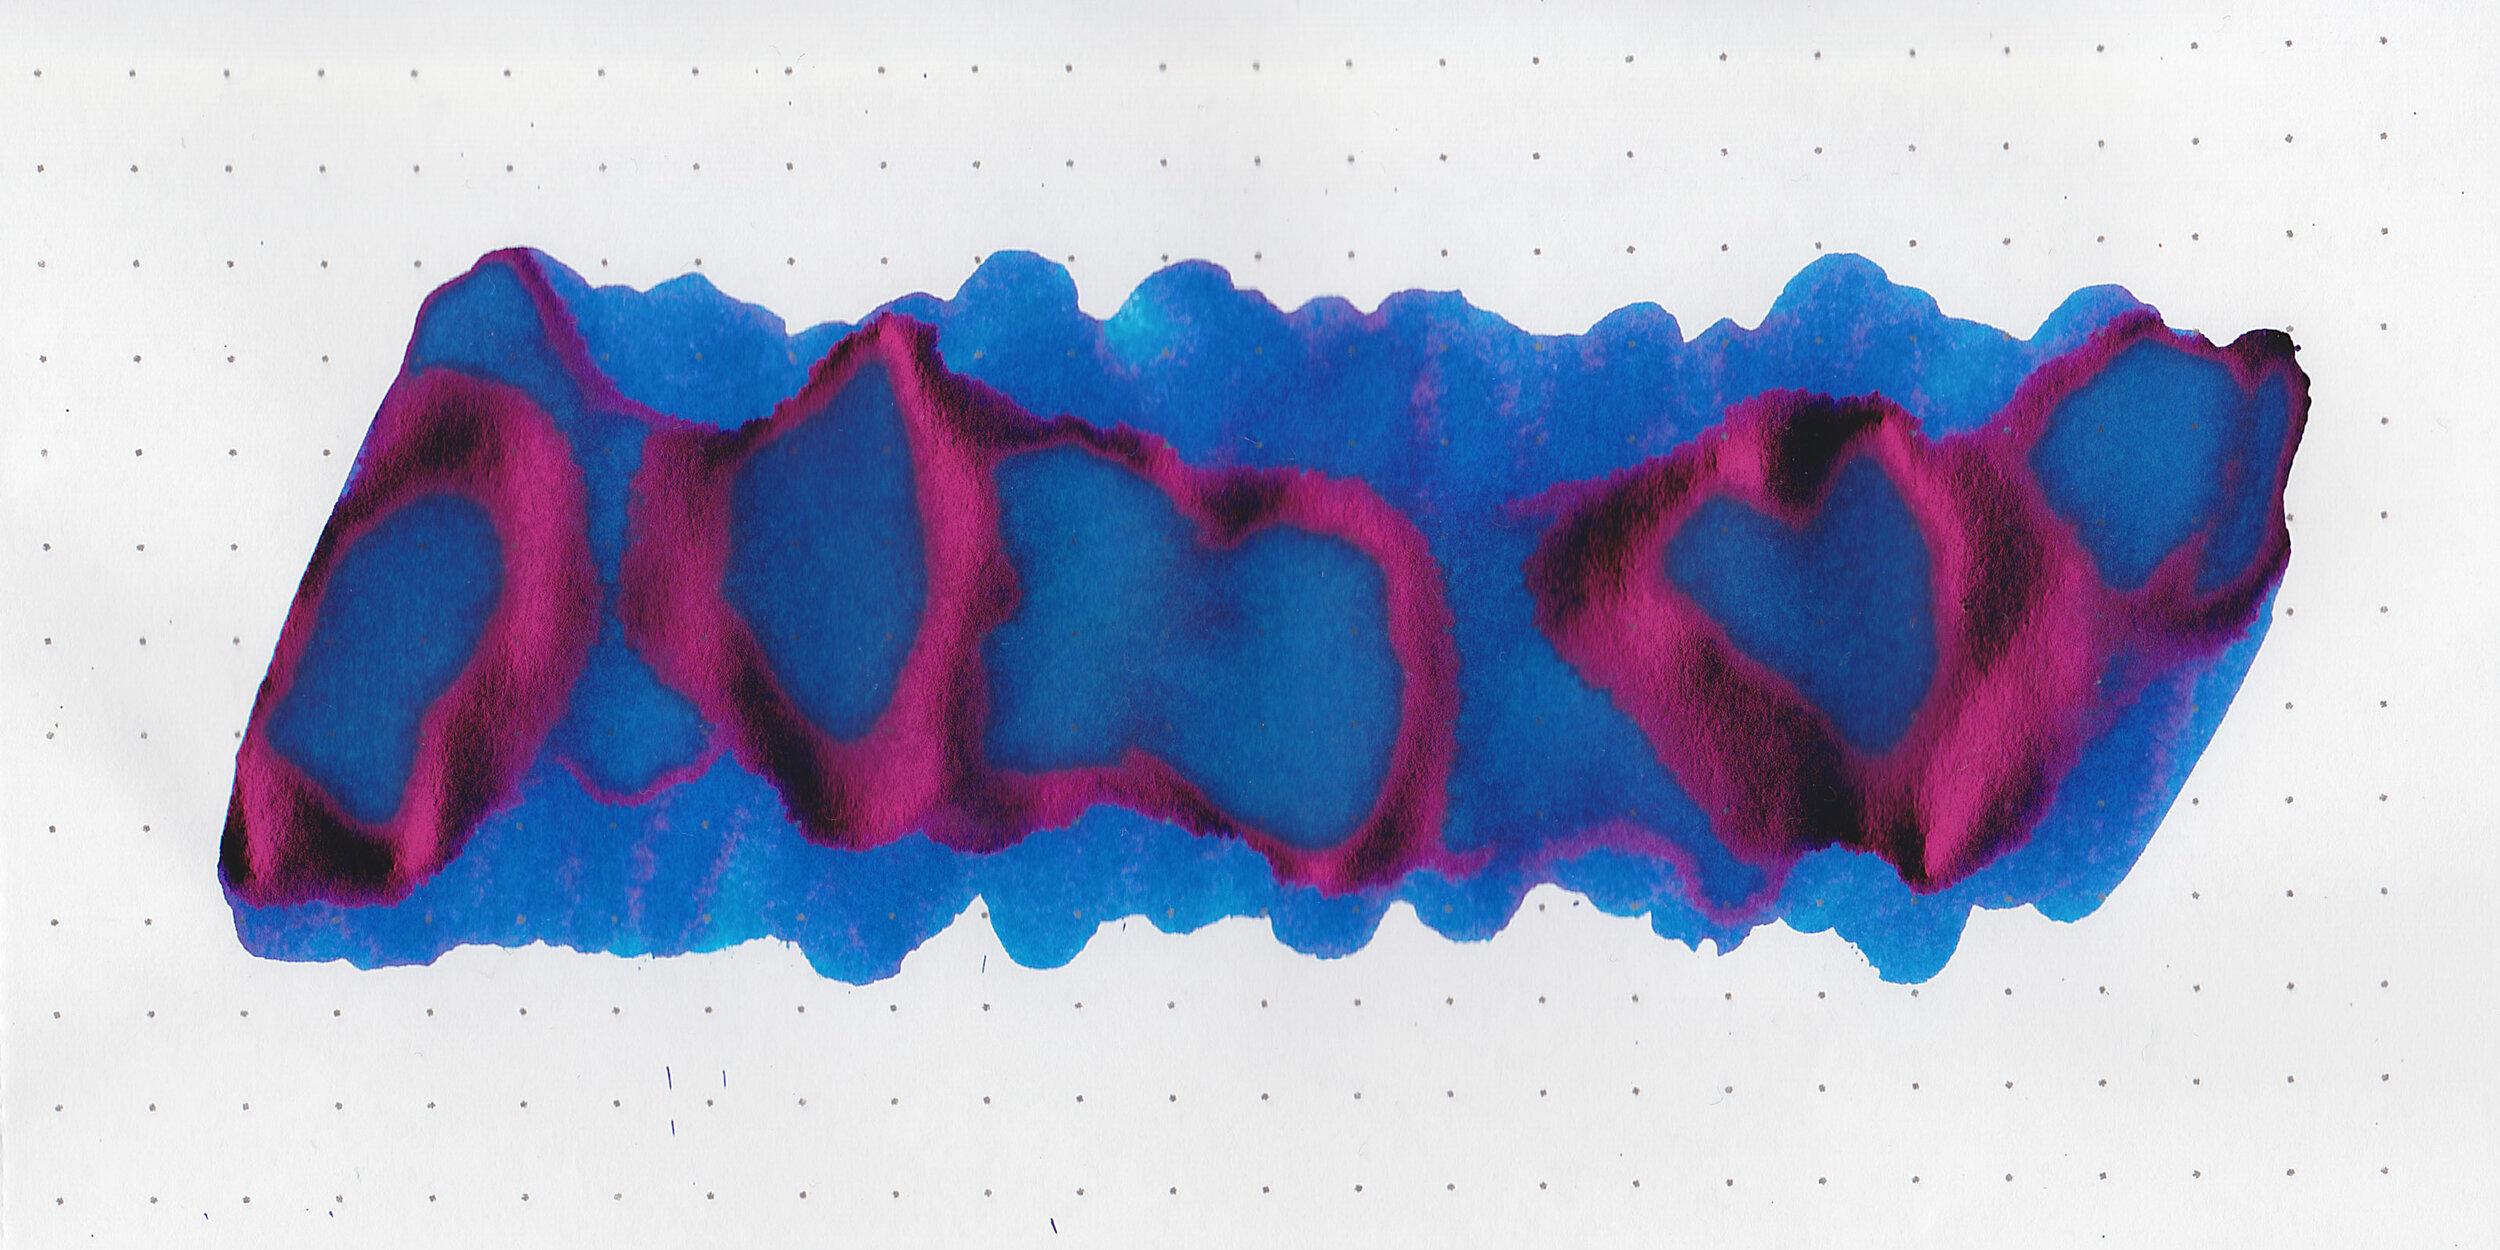 d-jalur-gemilang-3.jpg